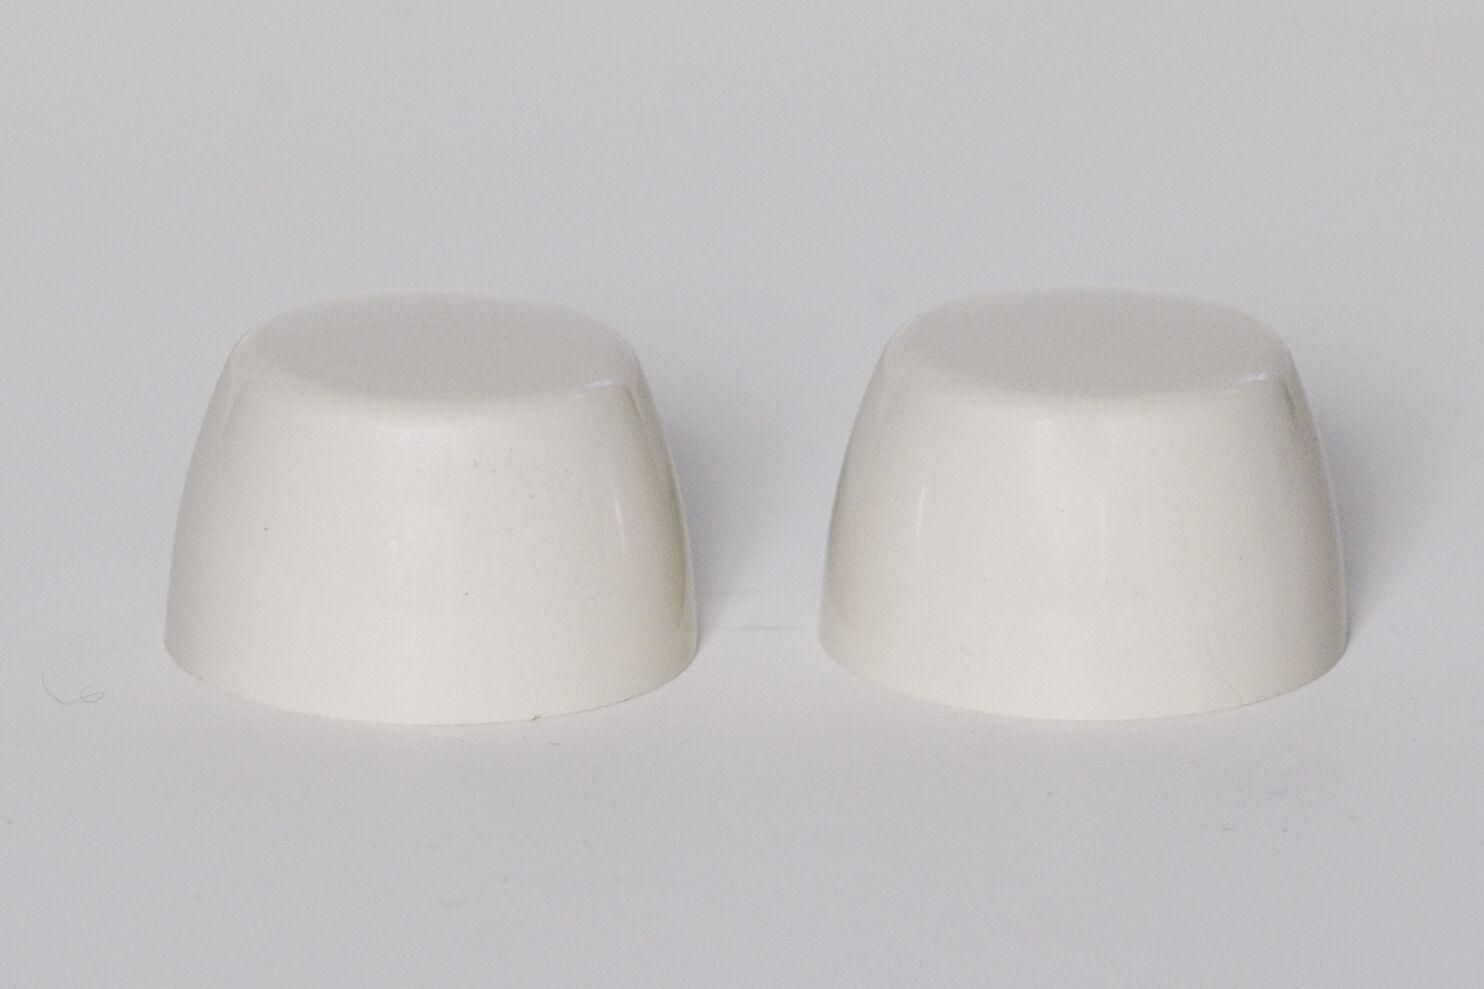 Set of 2 VENETIAN PINK Briggs Replacement Ceramic Toilet Bolt Caps